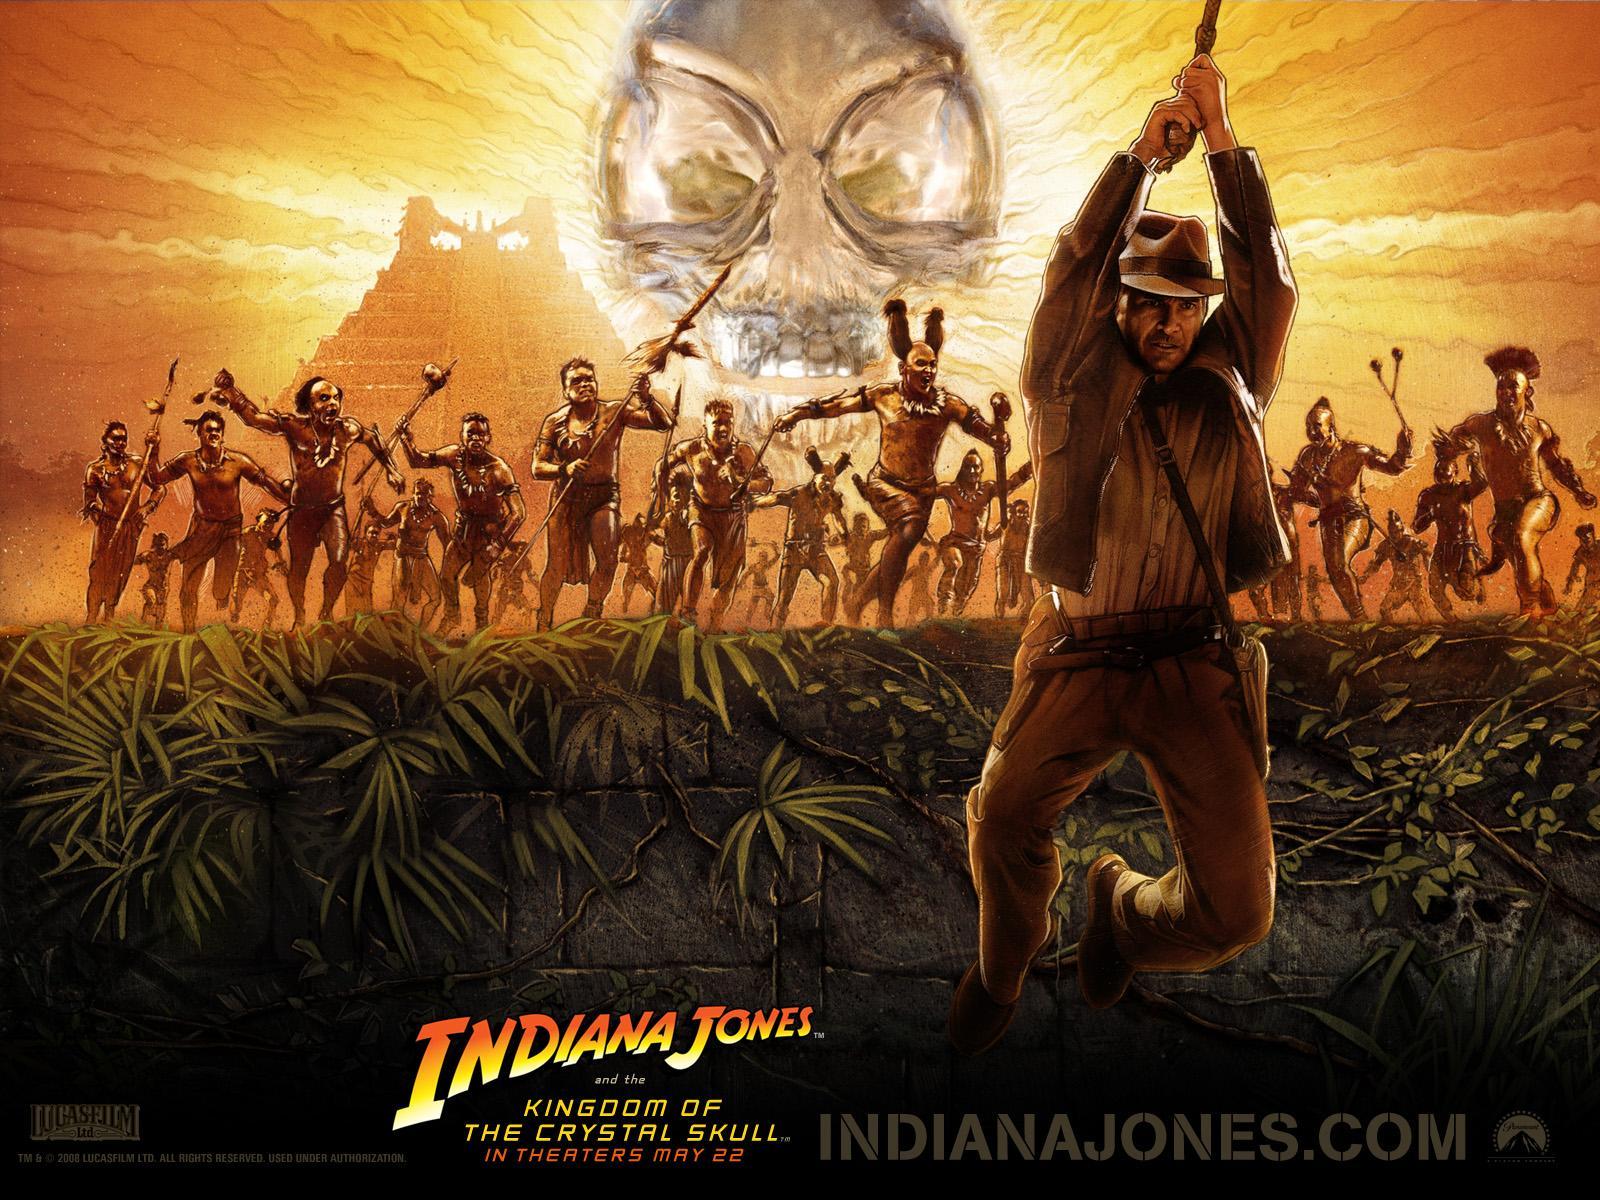 Photo Indiana Jones Indiana Jones and the Kingdom of the Crystal Skull film Movies